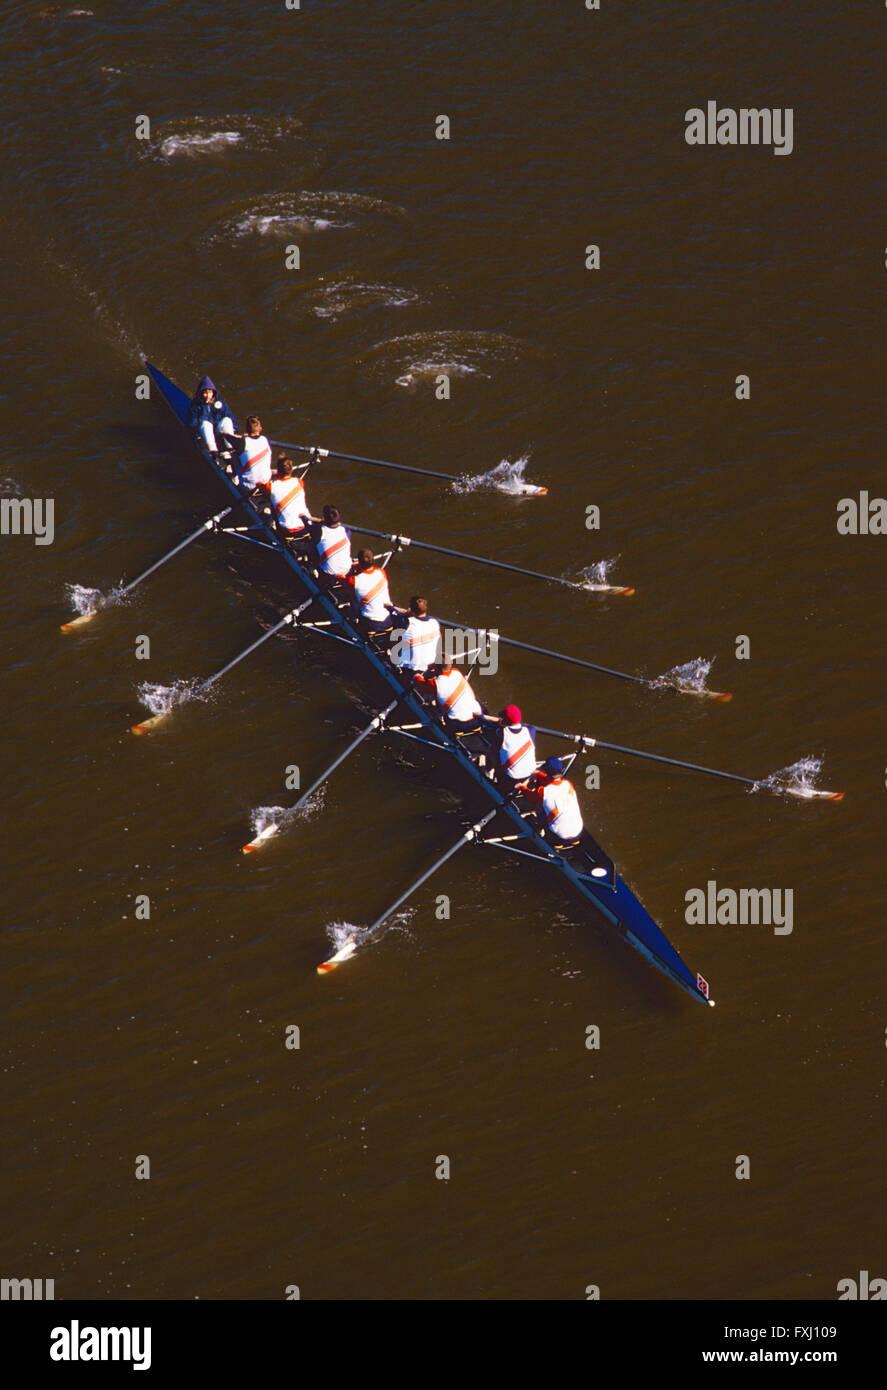 Scullers rowing in the Head of the Schuylkill Regatta; Schuykill River; Philadelphia; Pennsylvania; USA - Stock Image